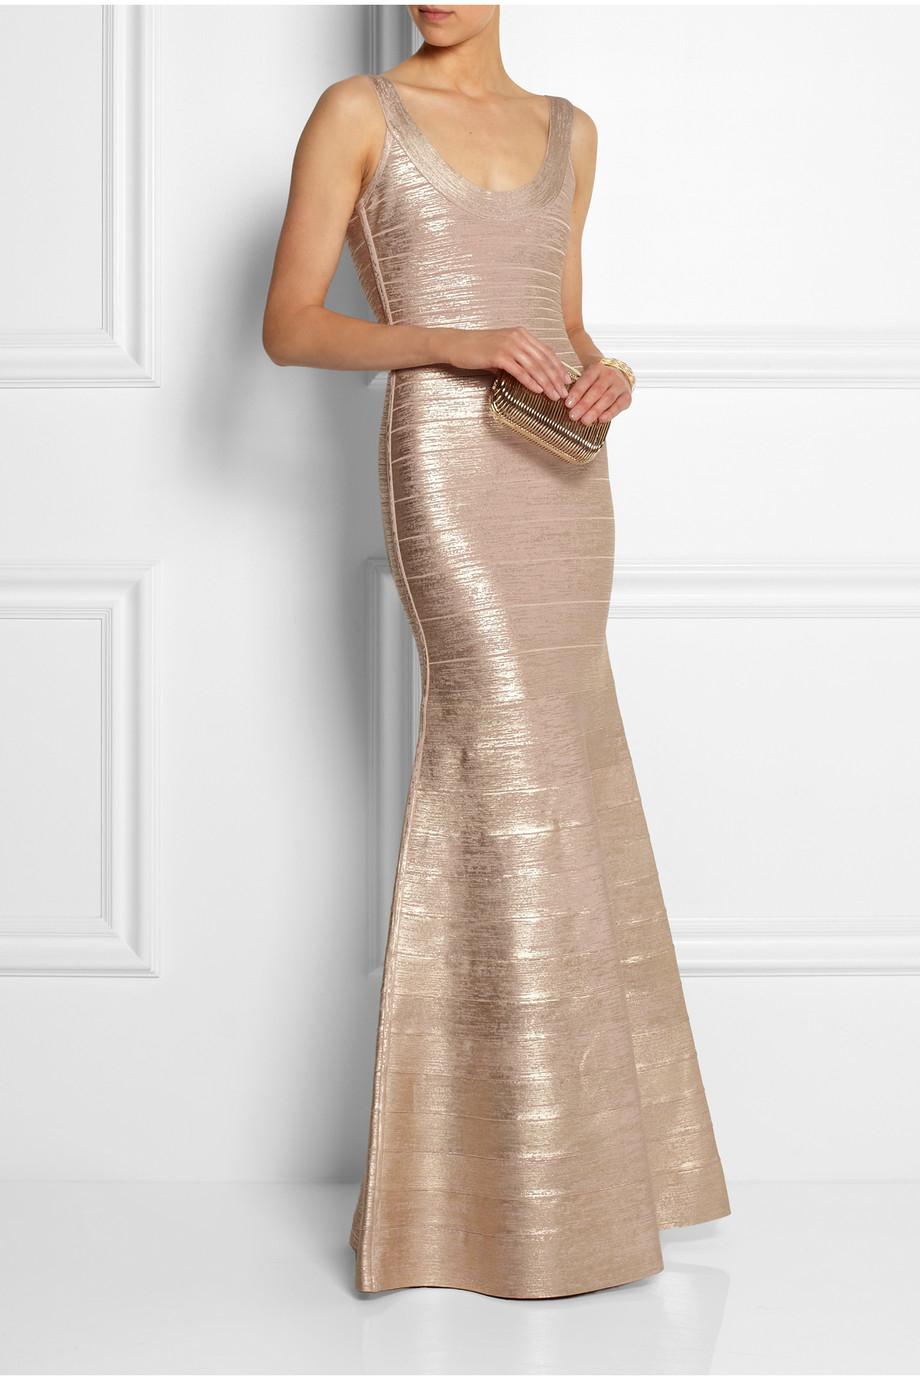 Herv 233 L 233 Ger Ellen Metallic Bandage Gown In Rose Gold Pink Lyst